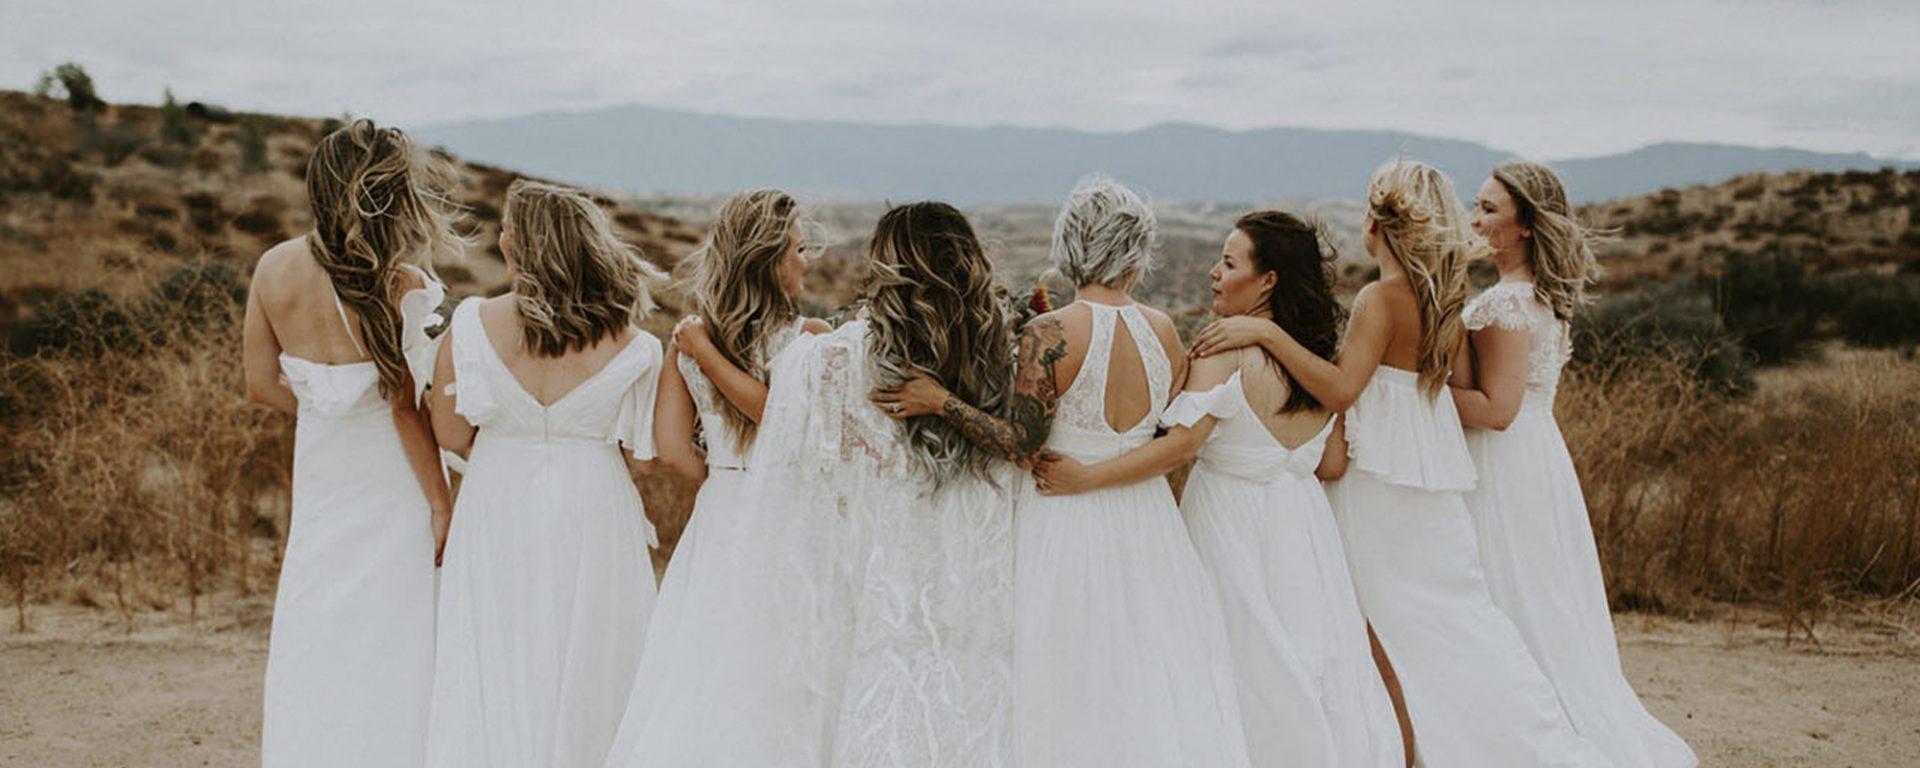 vestidos boda estilo boho